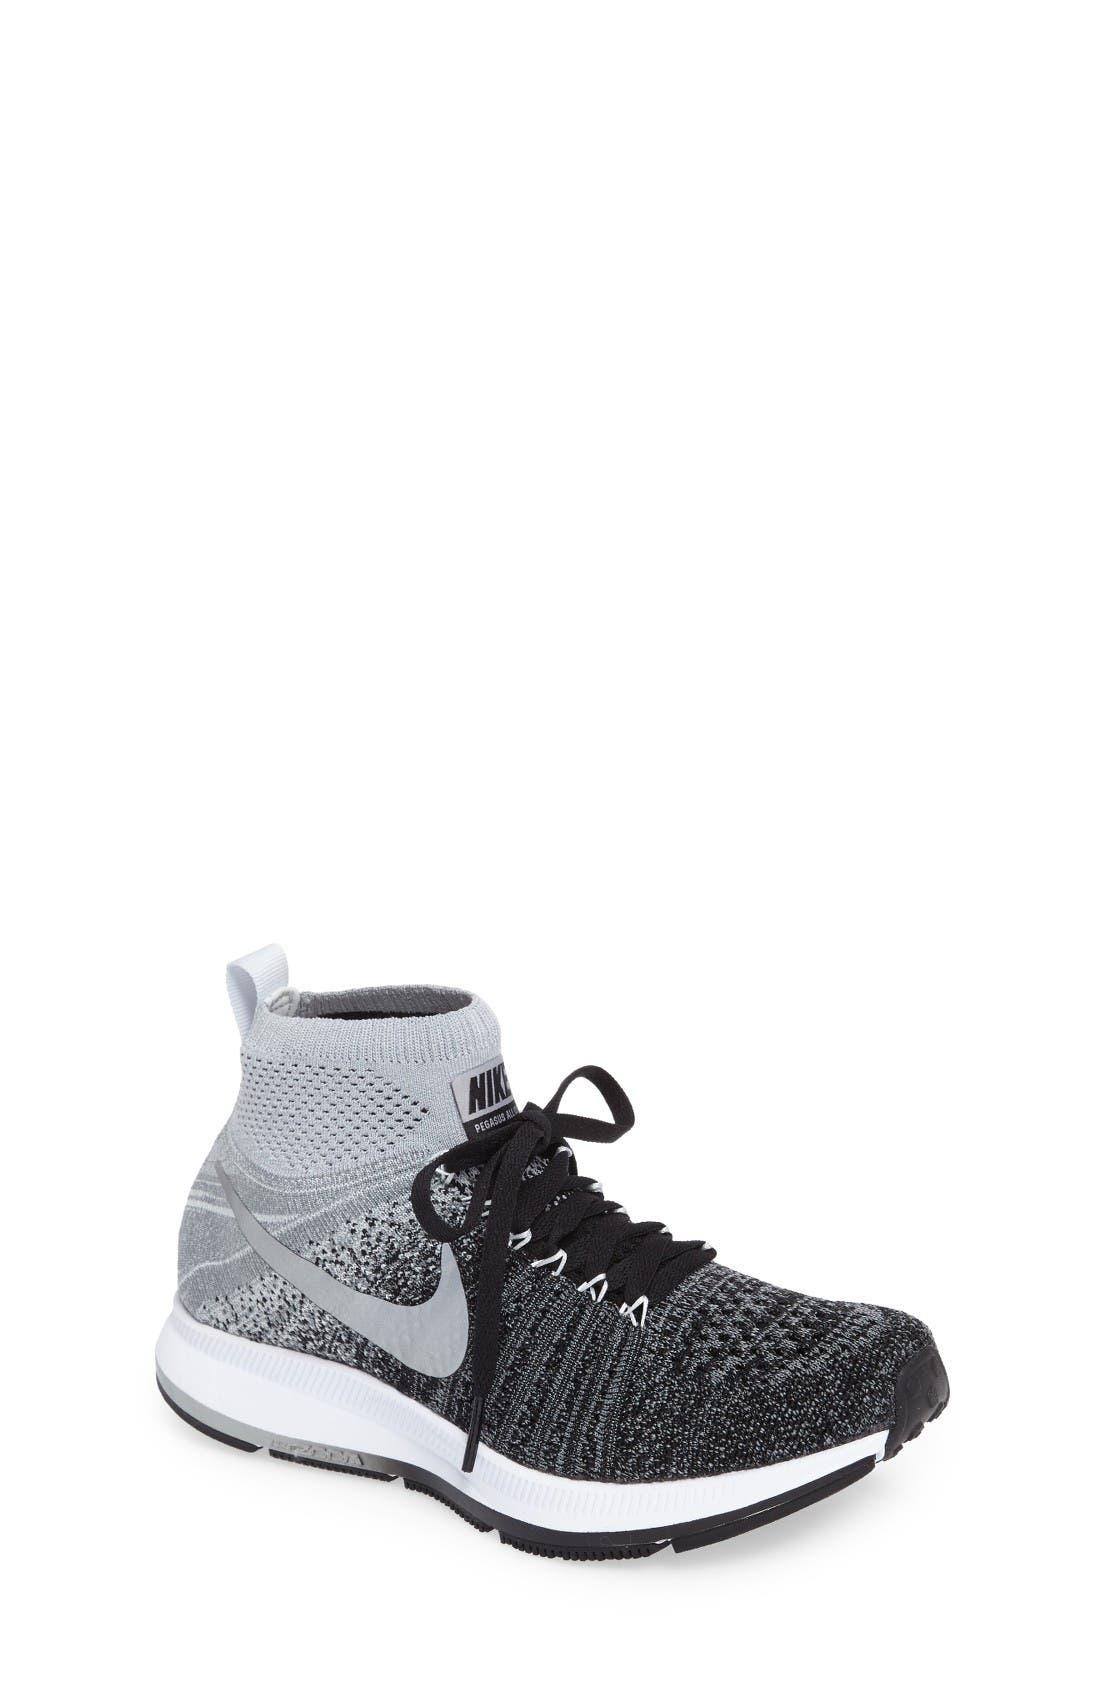 Main Image - Nike Air Zoom Pegasus All Out Flyknit Running Shoe (Big Kid)